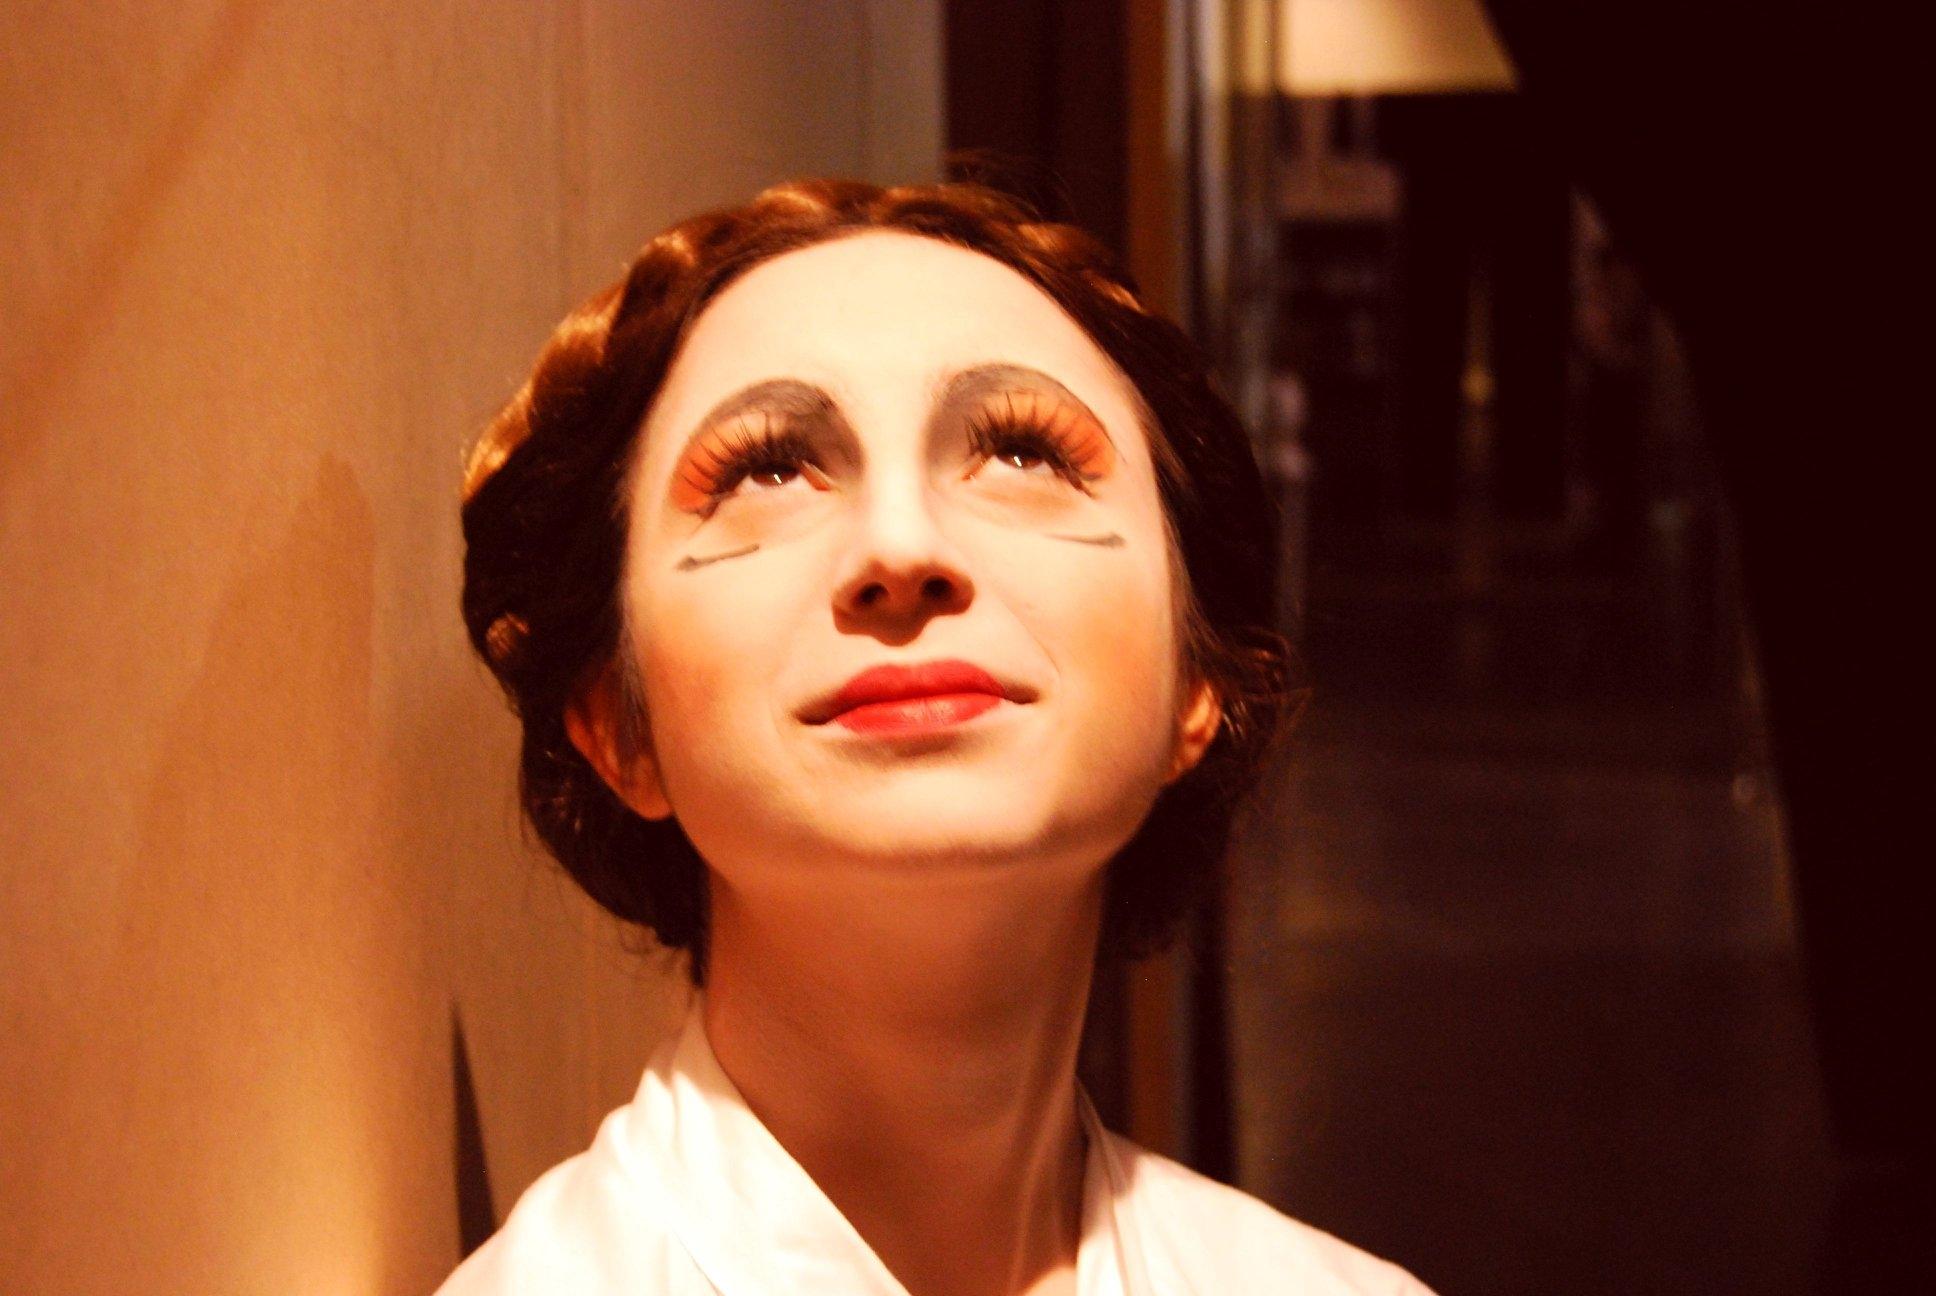 6-lucia-leonardi-portrait.jpg